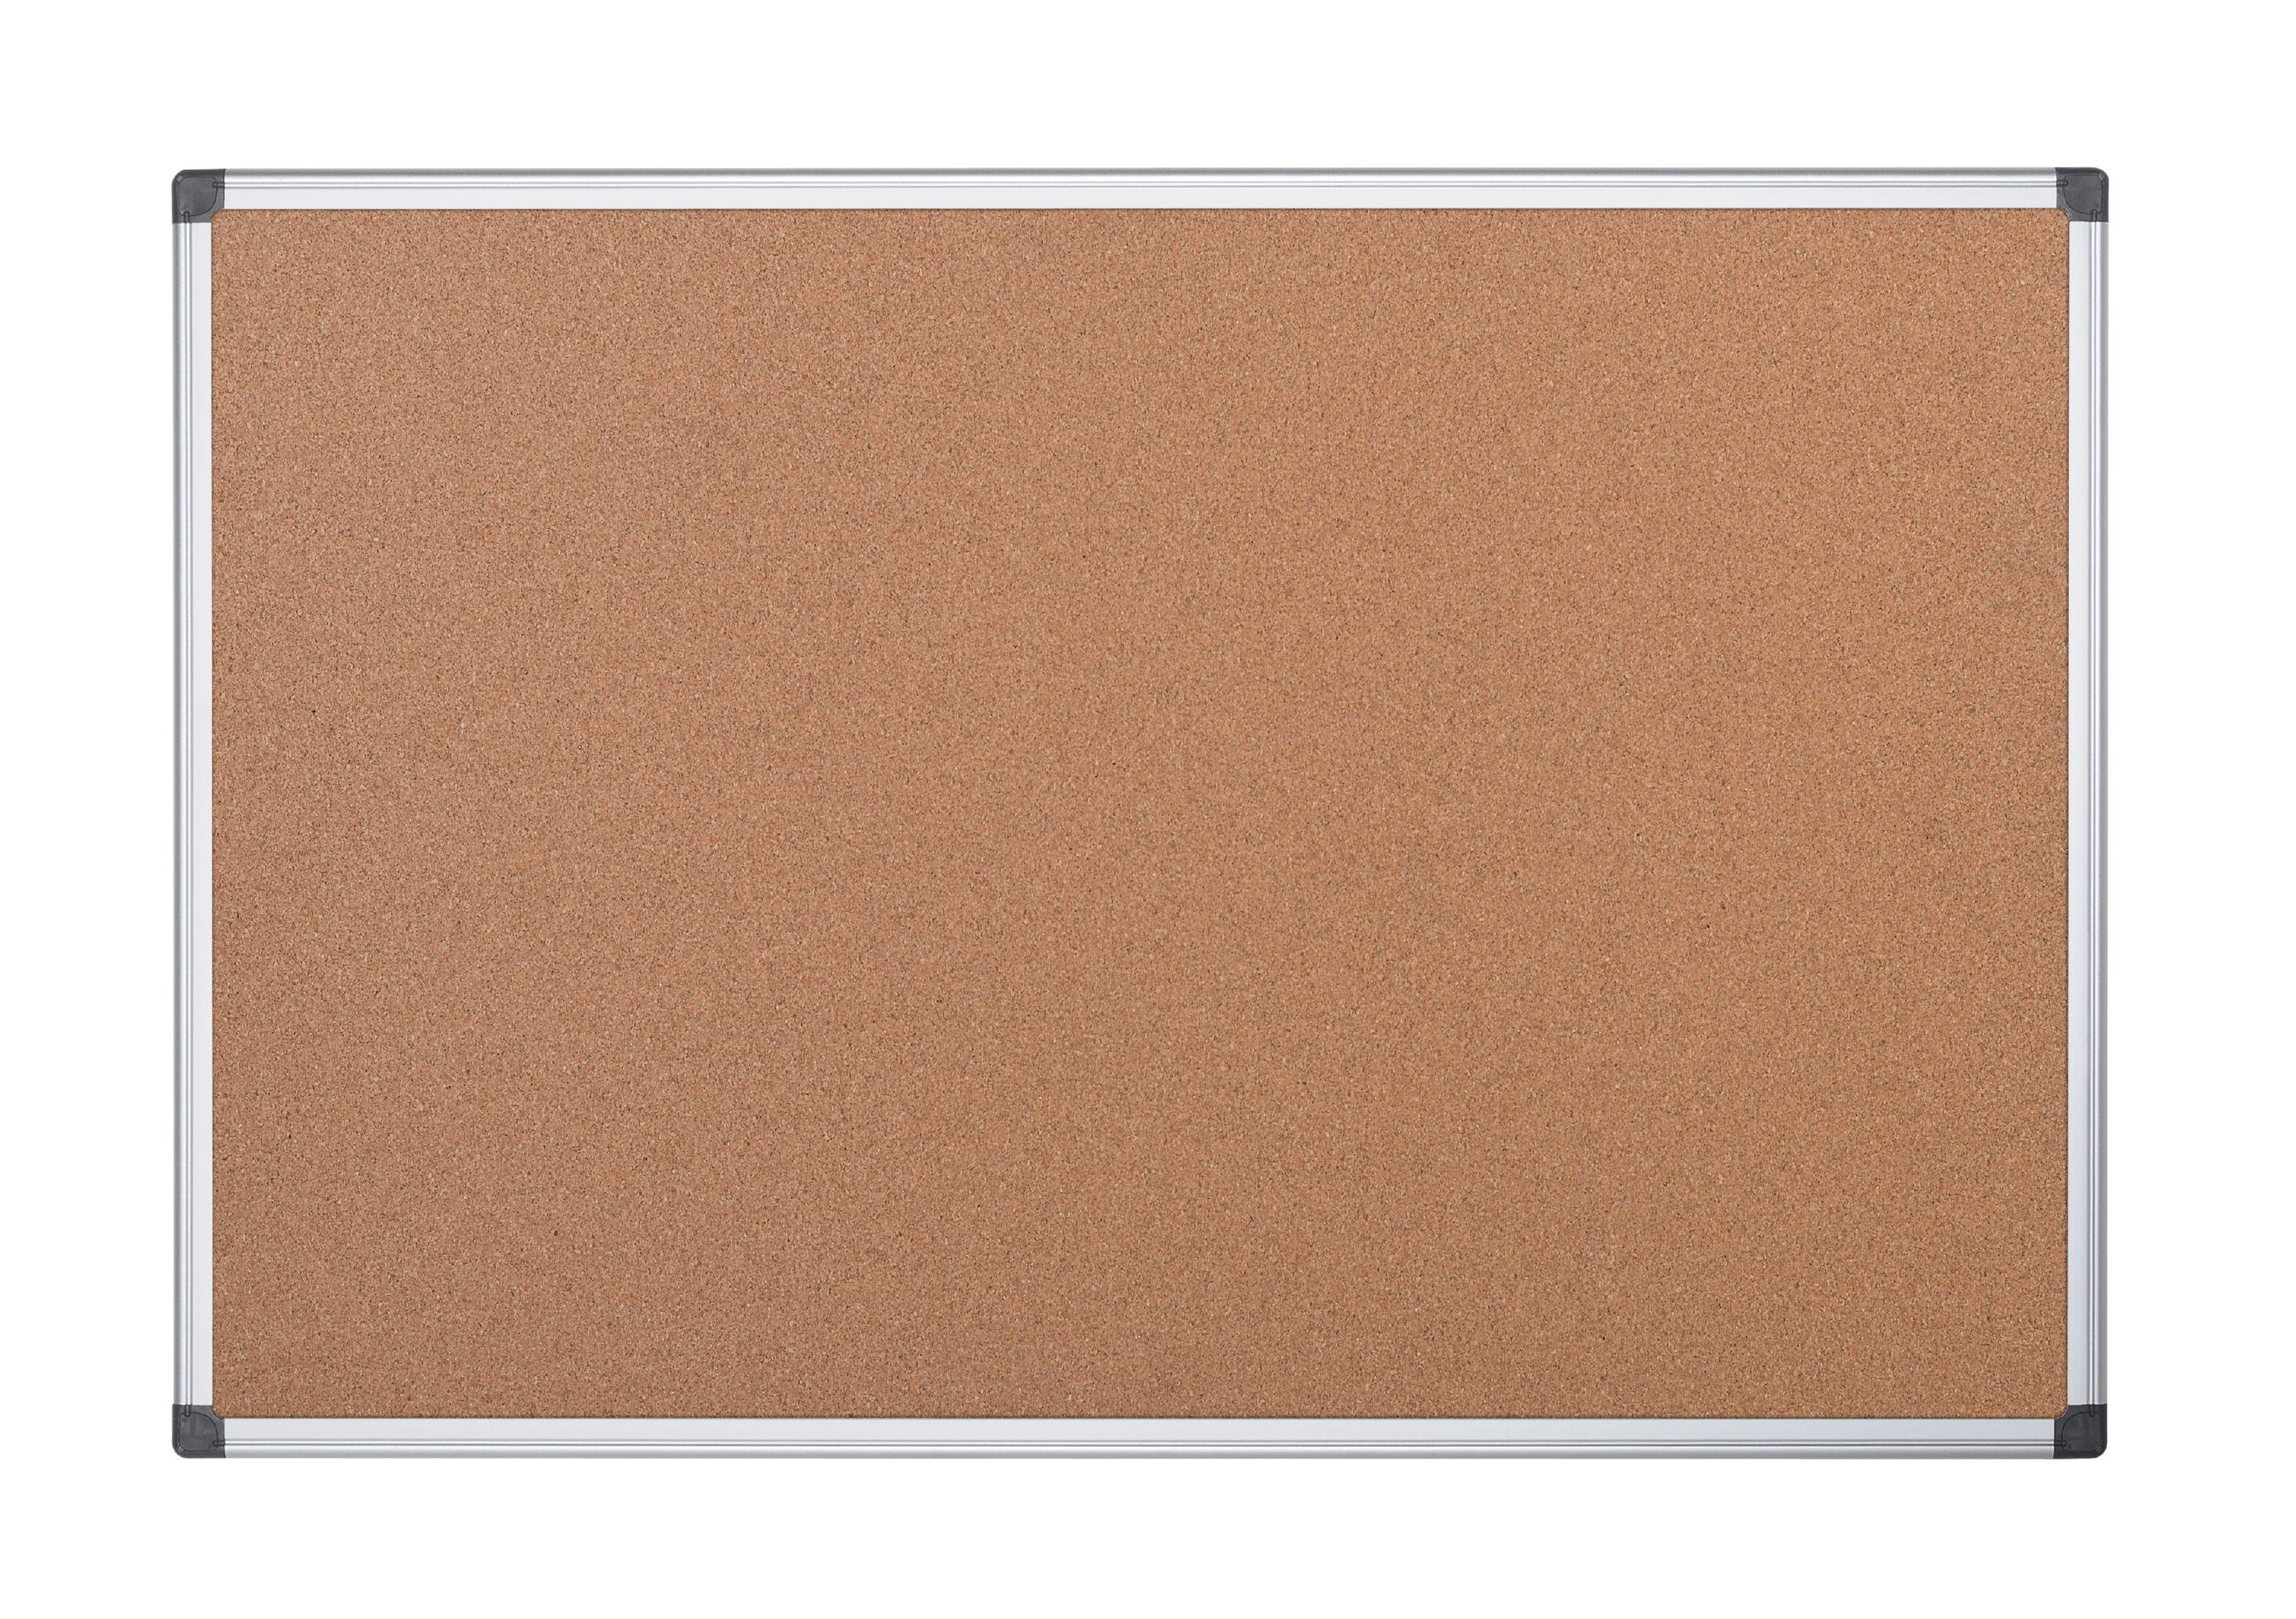 Cork Bi-Office Maya Cork Noticeboard Double Sided Aluminium Frame 900x600mm